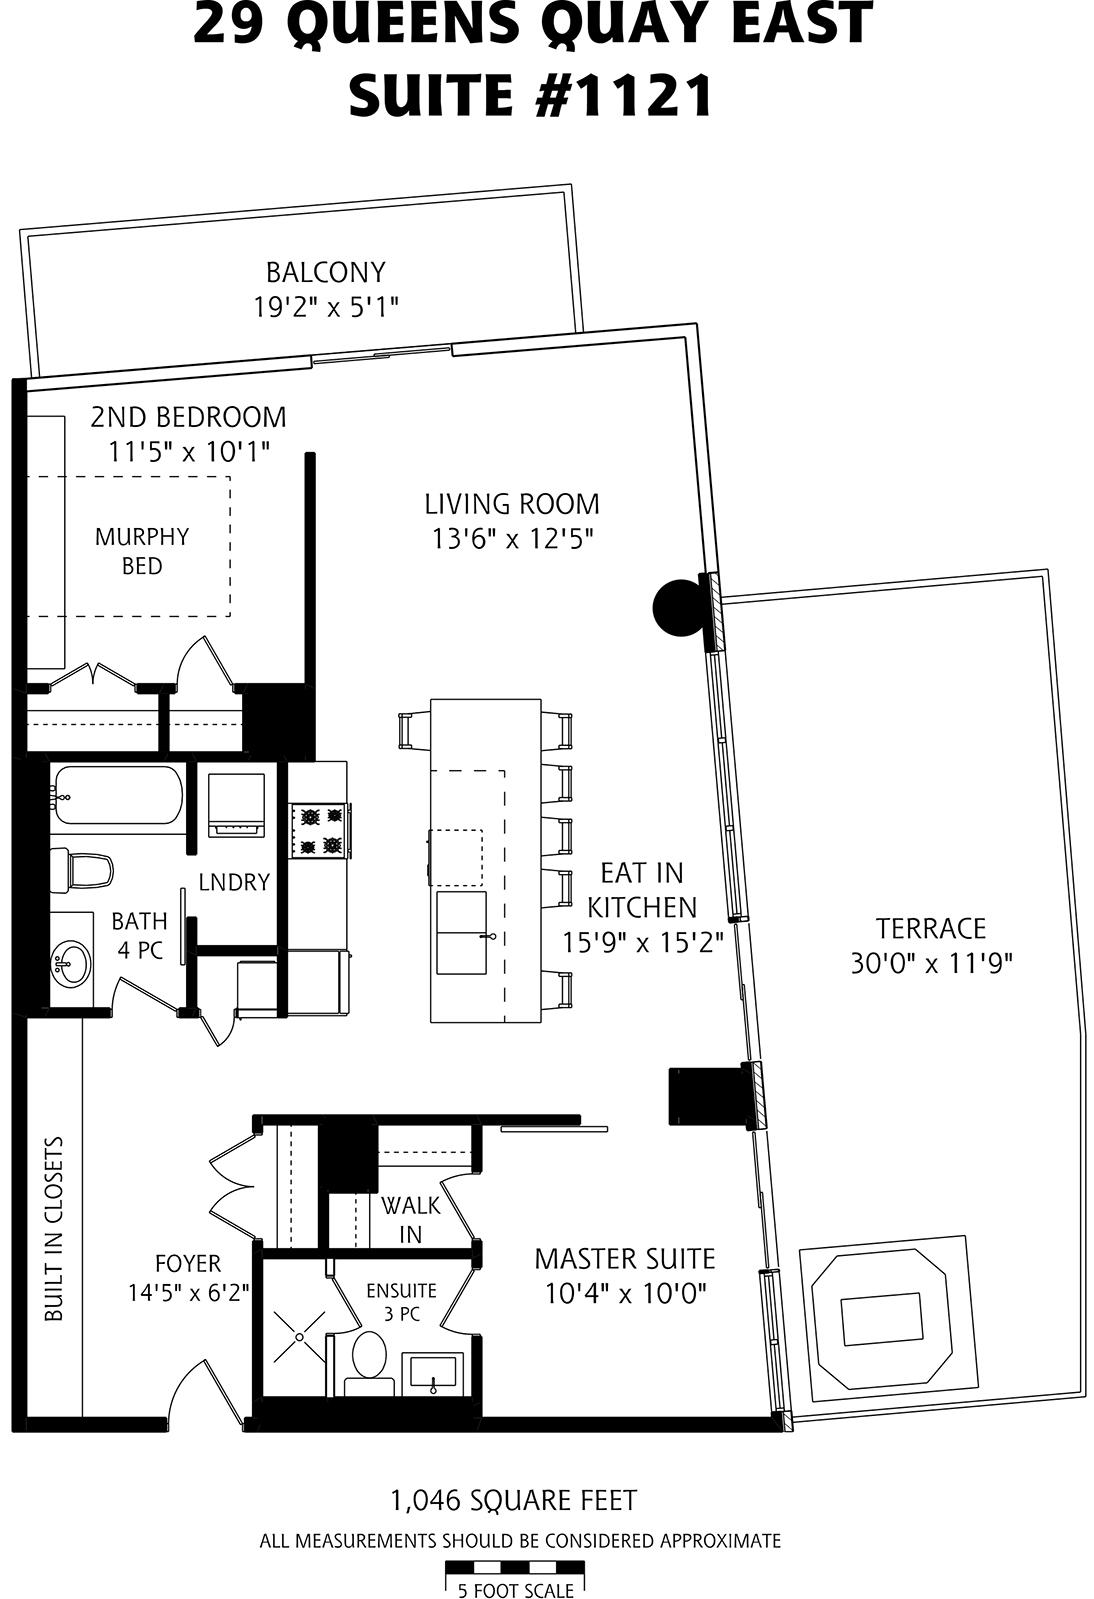 29 Queens Quay E #1121 - Floor Plans.jpg